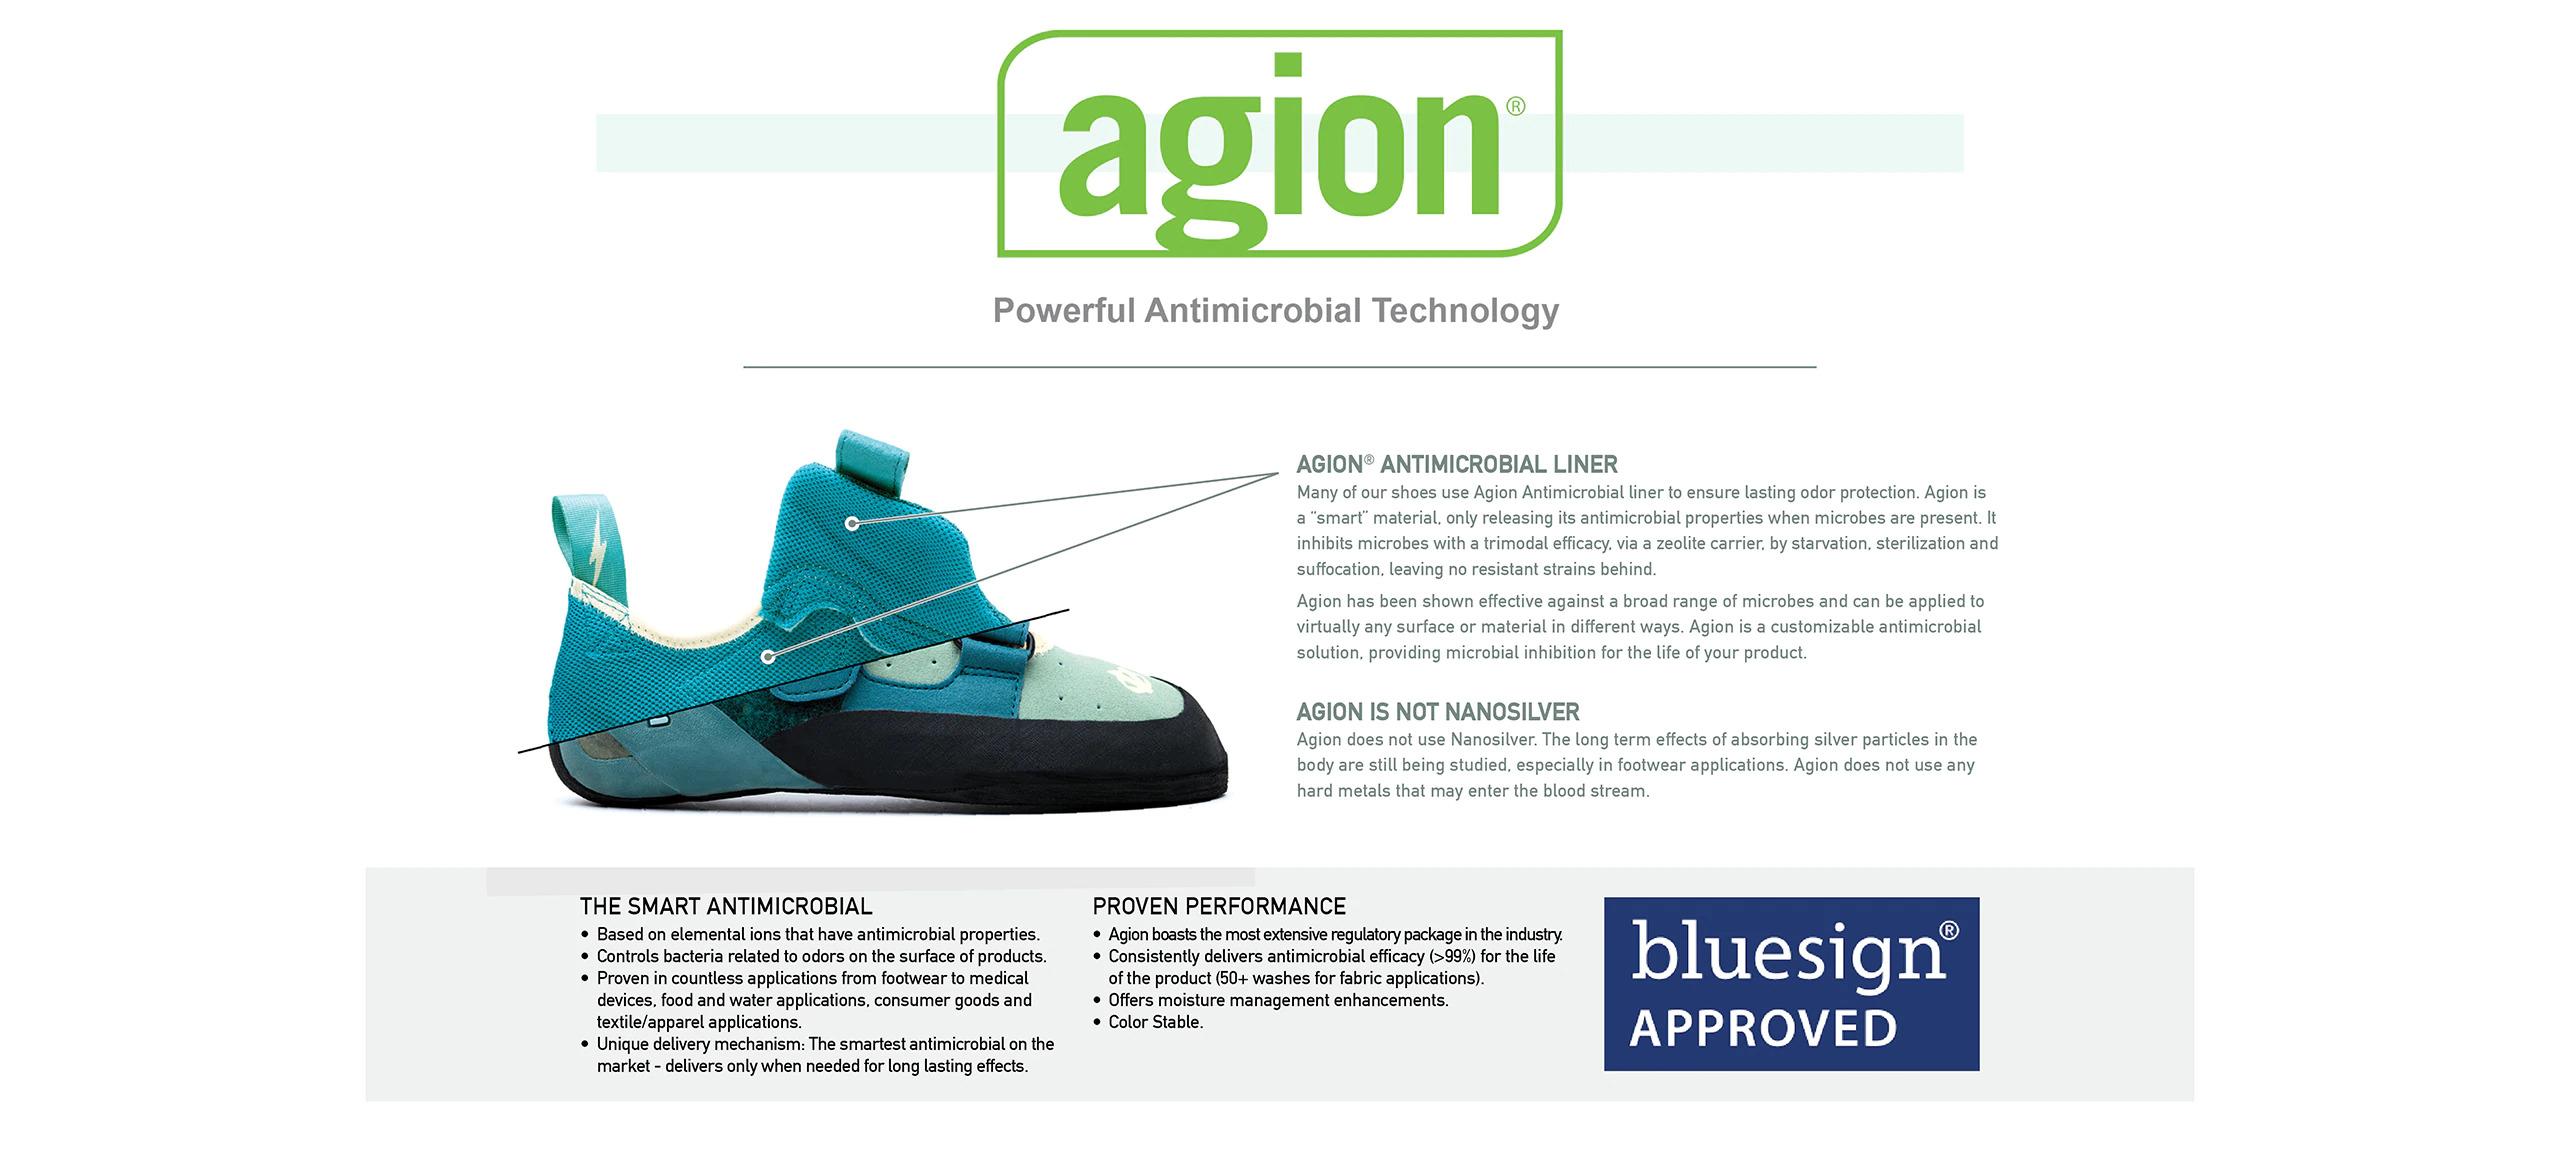 agion powerful antimicrobial technology